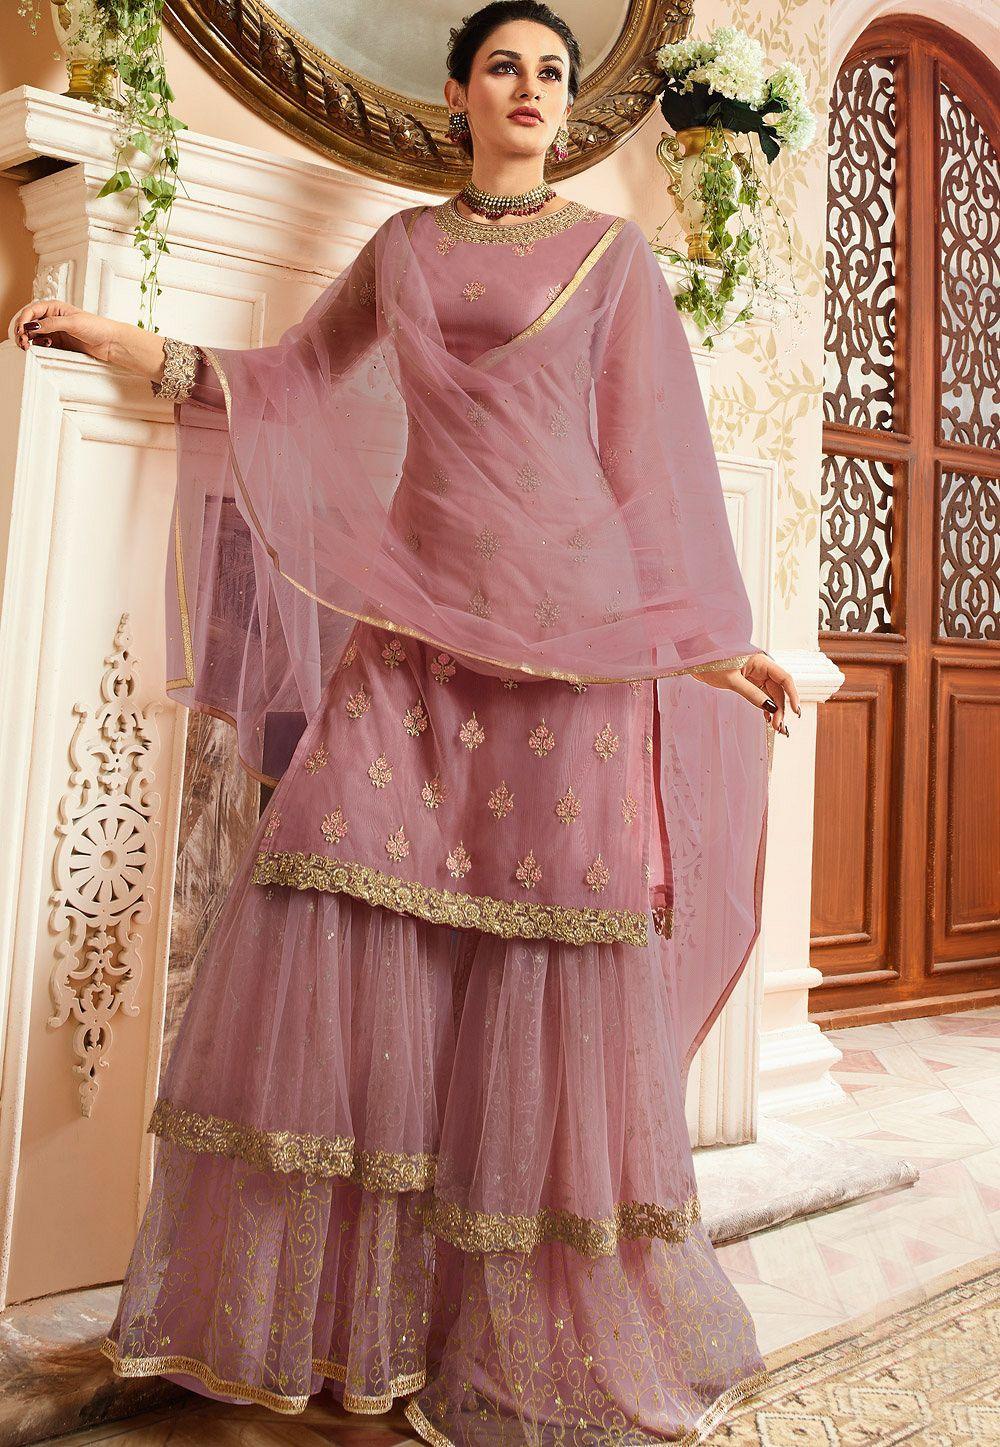 66510da243 Purple satin net embroidered sharara style pakistani suit 15305 in ...